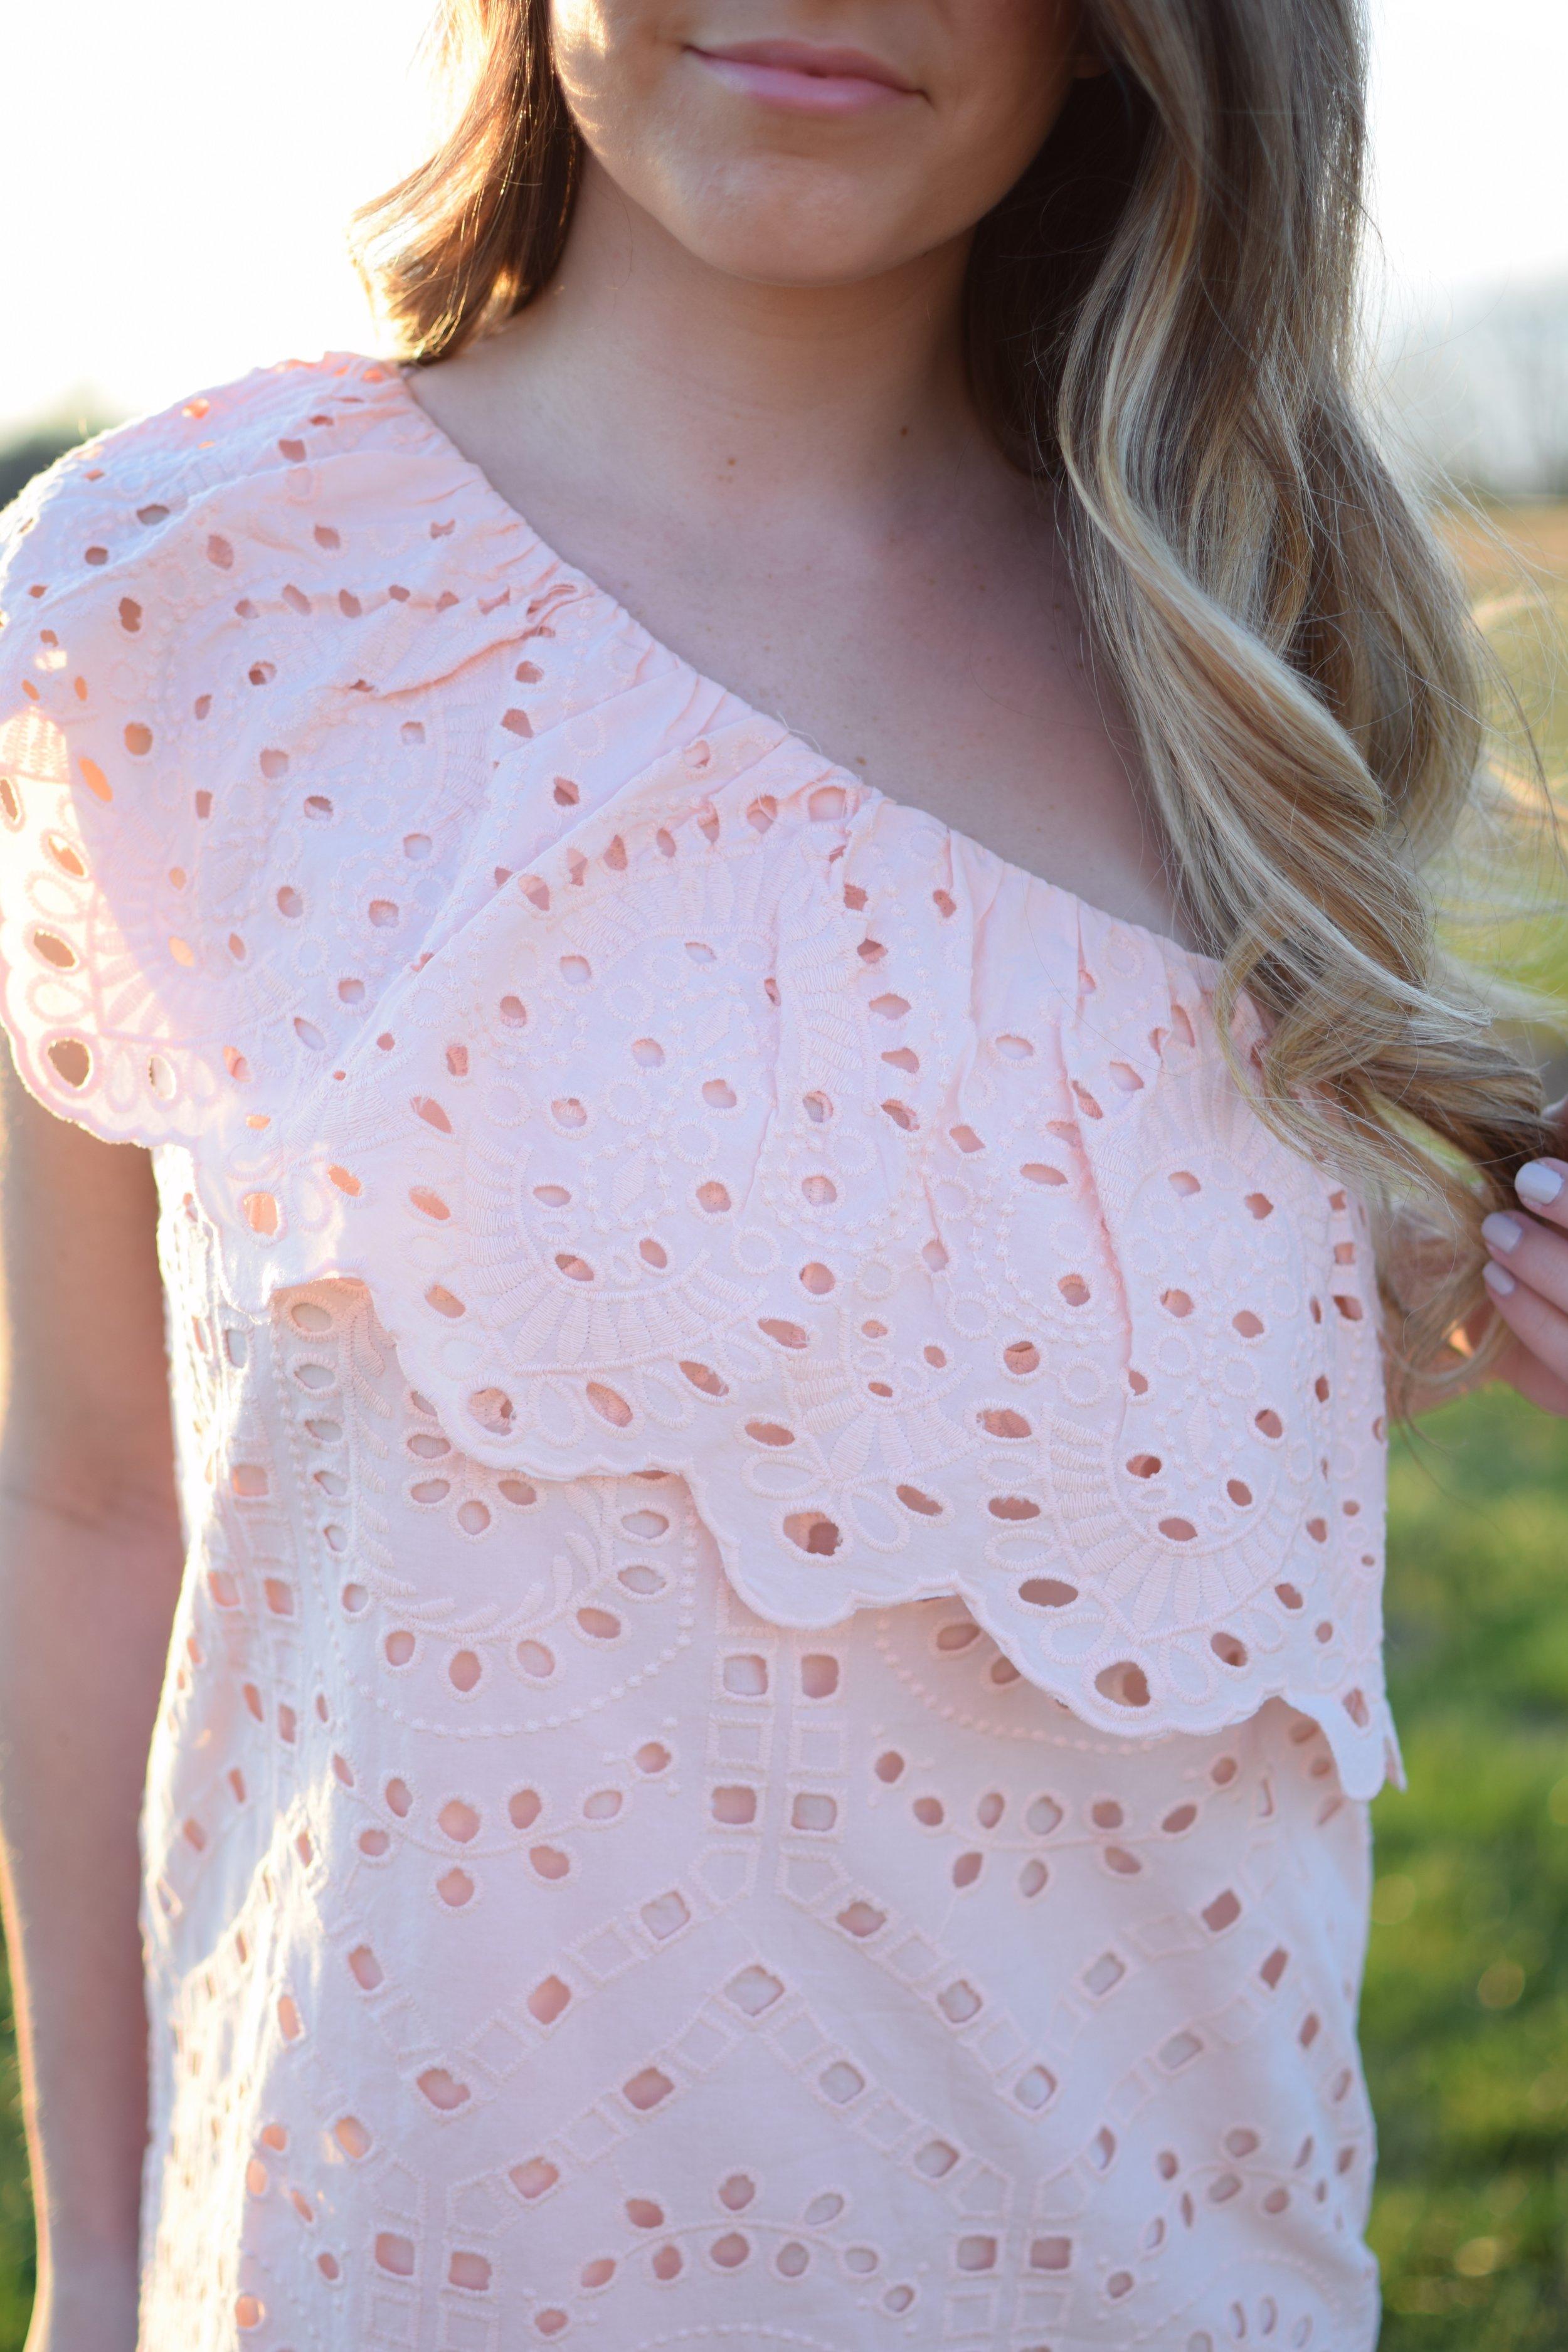 blush one shoulder dress / spring outfit idea / guest of wedding dress idea